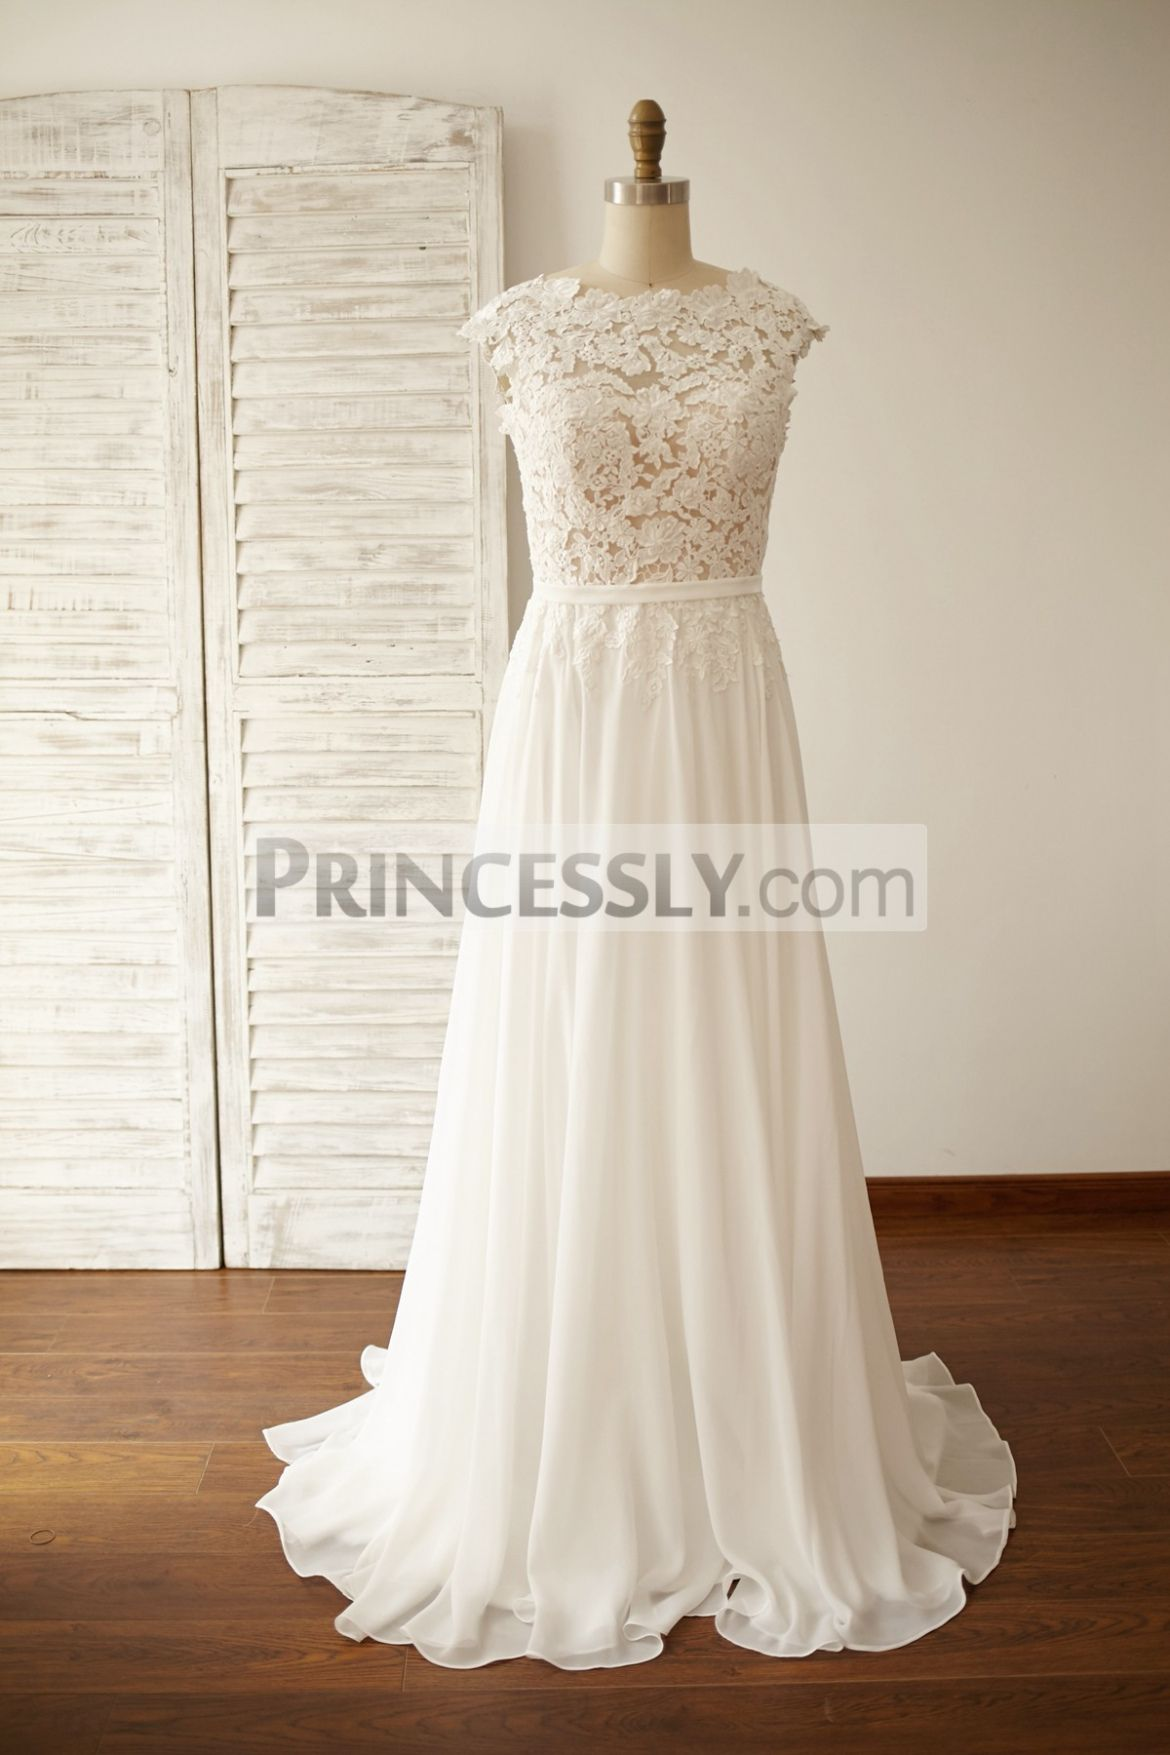 2019 Chiffon Lace Wedding Dress - Cute Dresses for A Wedding Check ...